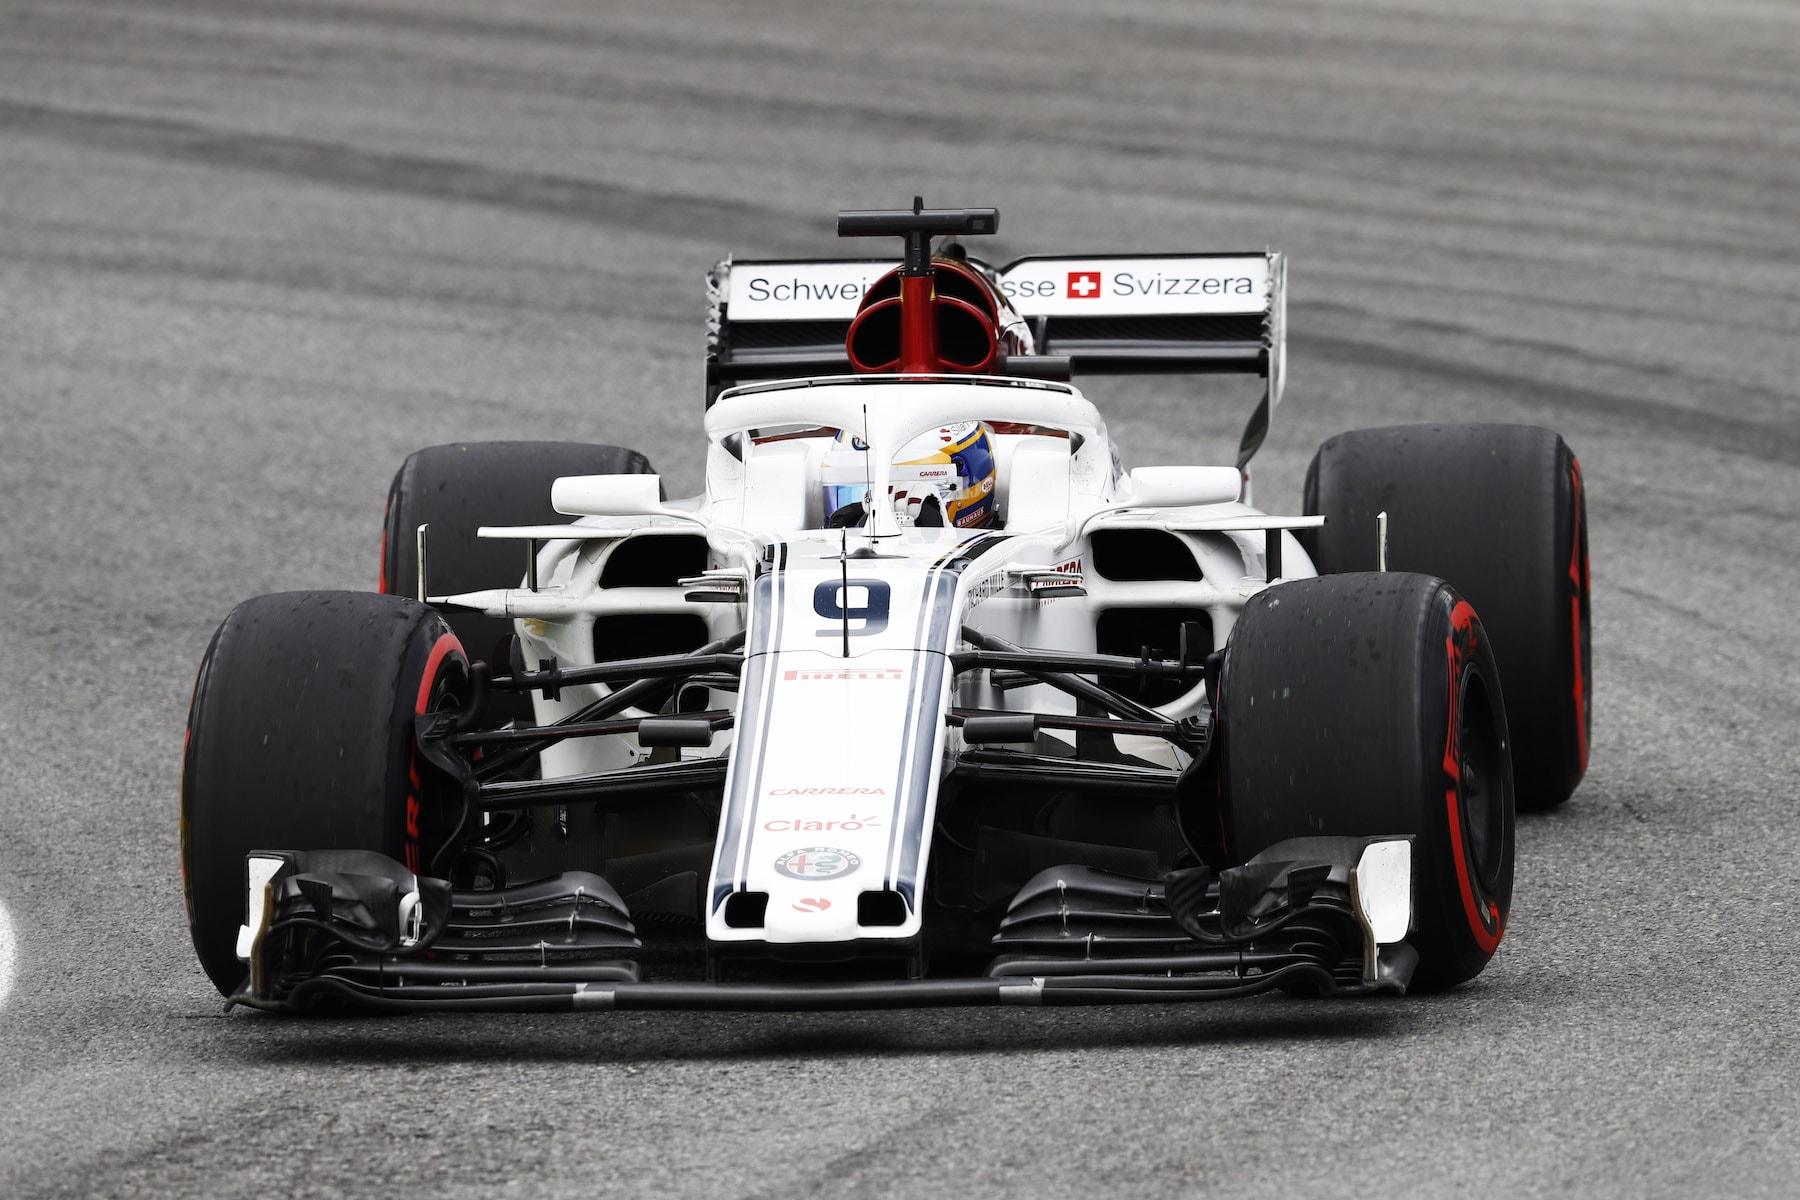 1 2018 Marcus Ericsson | Sauber C37 | 2018 Brazilian GP Q3 1 copy.jpg